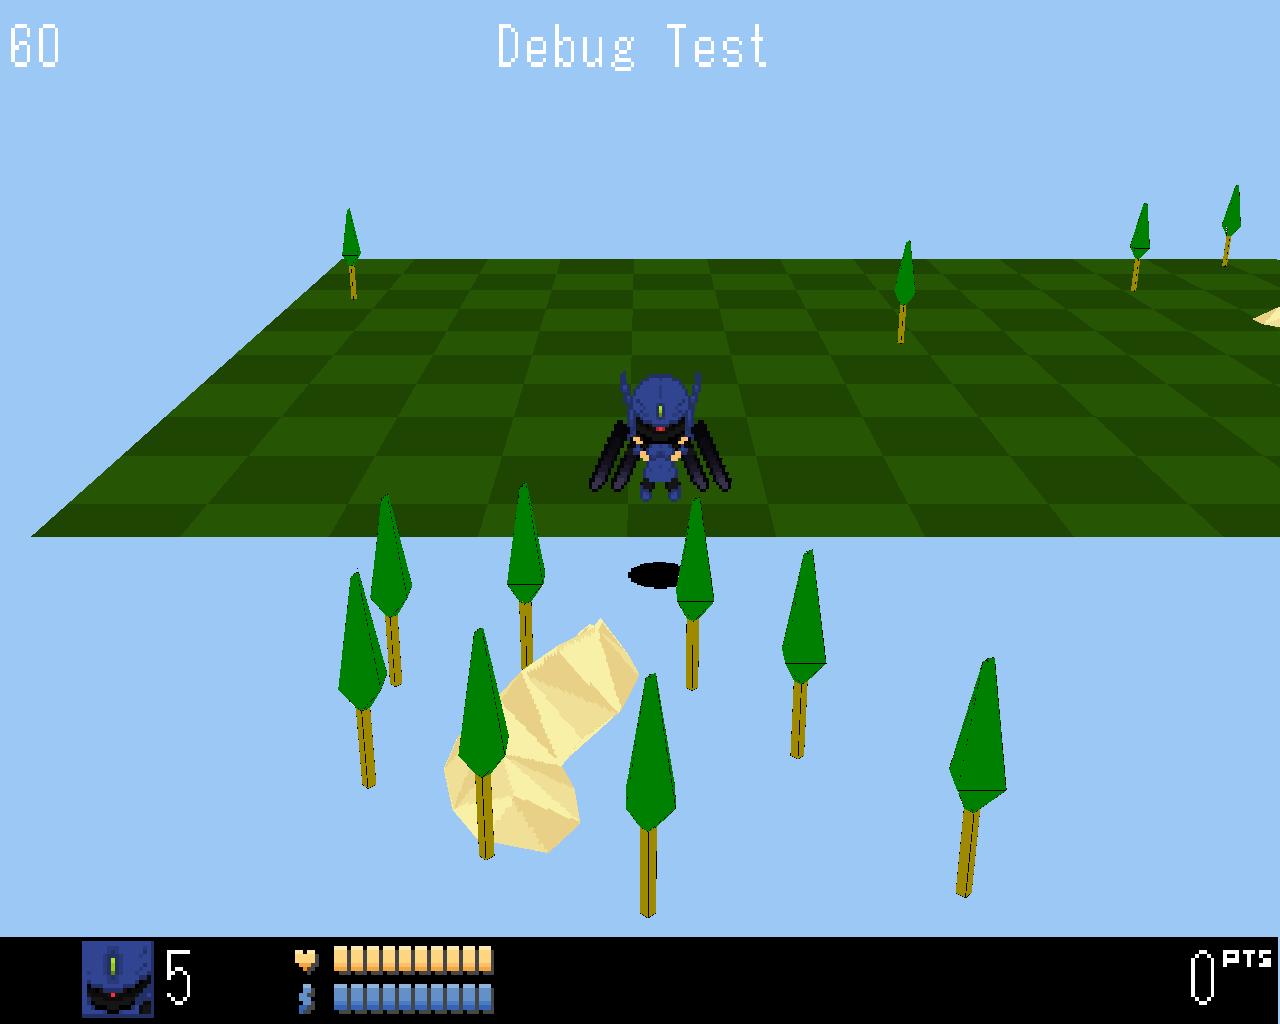 [Résolu] 3D Disparition d'objets  Screen_Inifinite_Debug